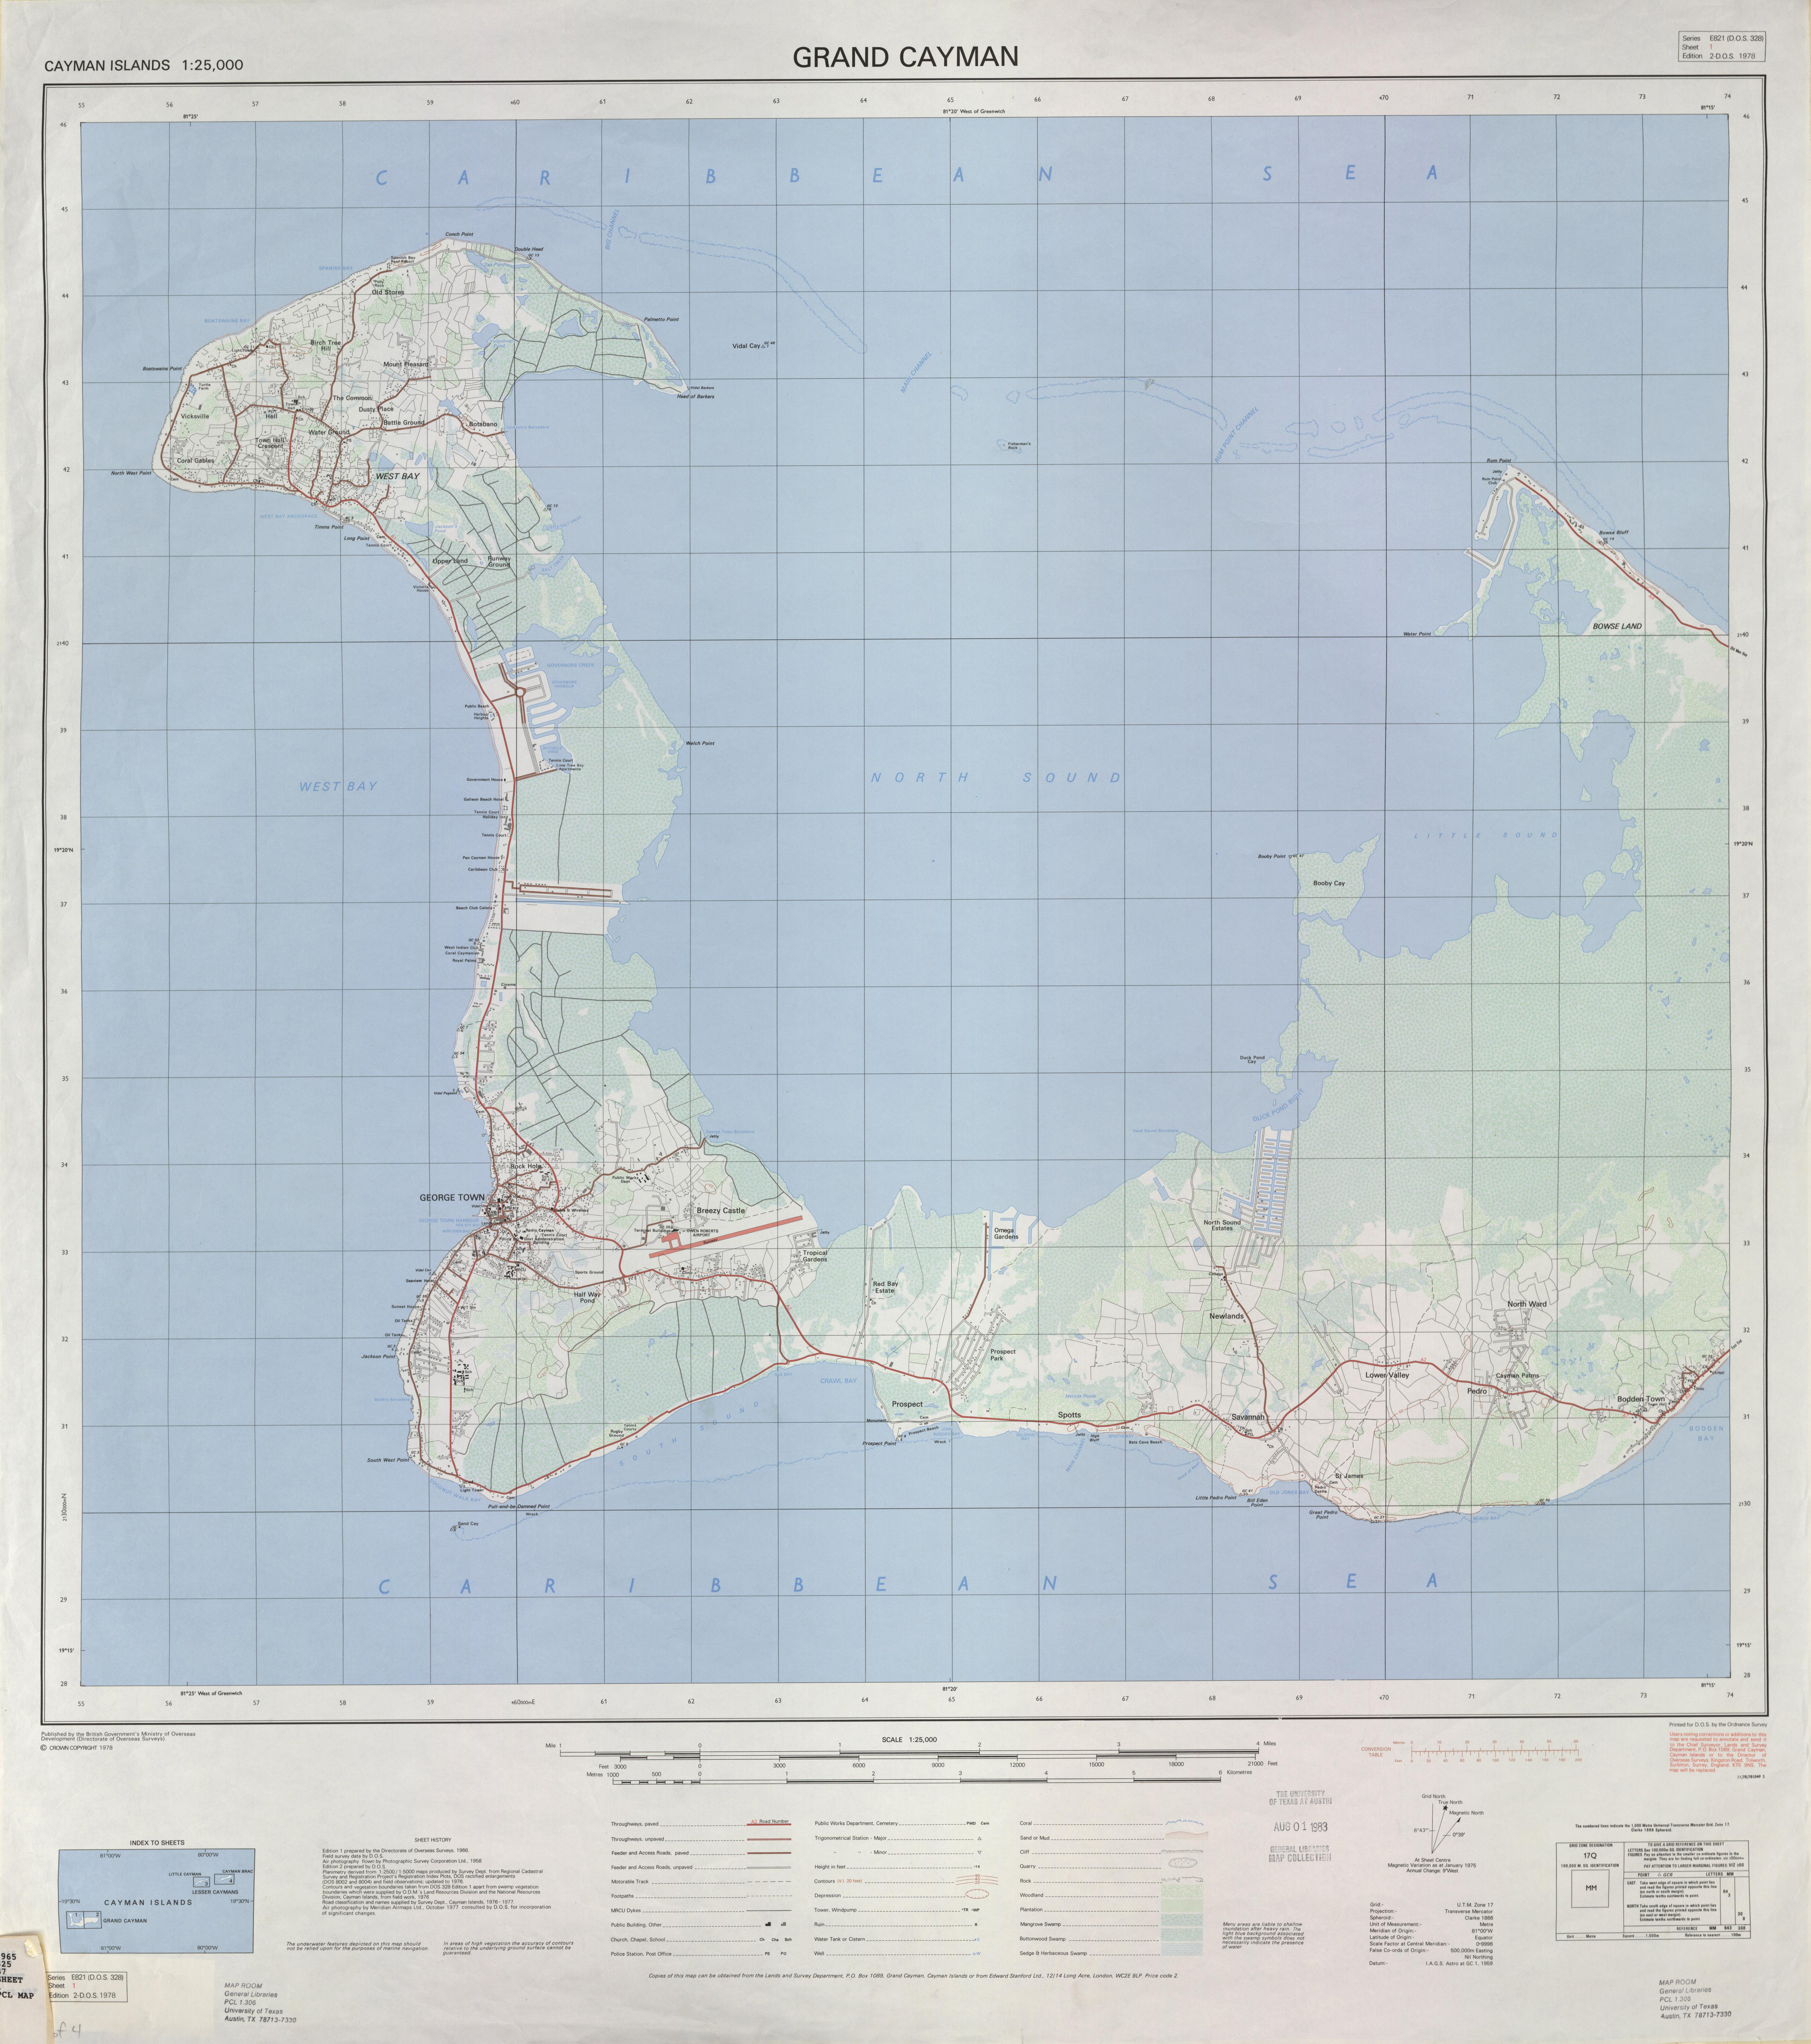 Cayman Islands AMS Topographic Maps PerryCastañeda Map - Cayman islands map